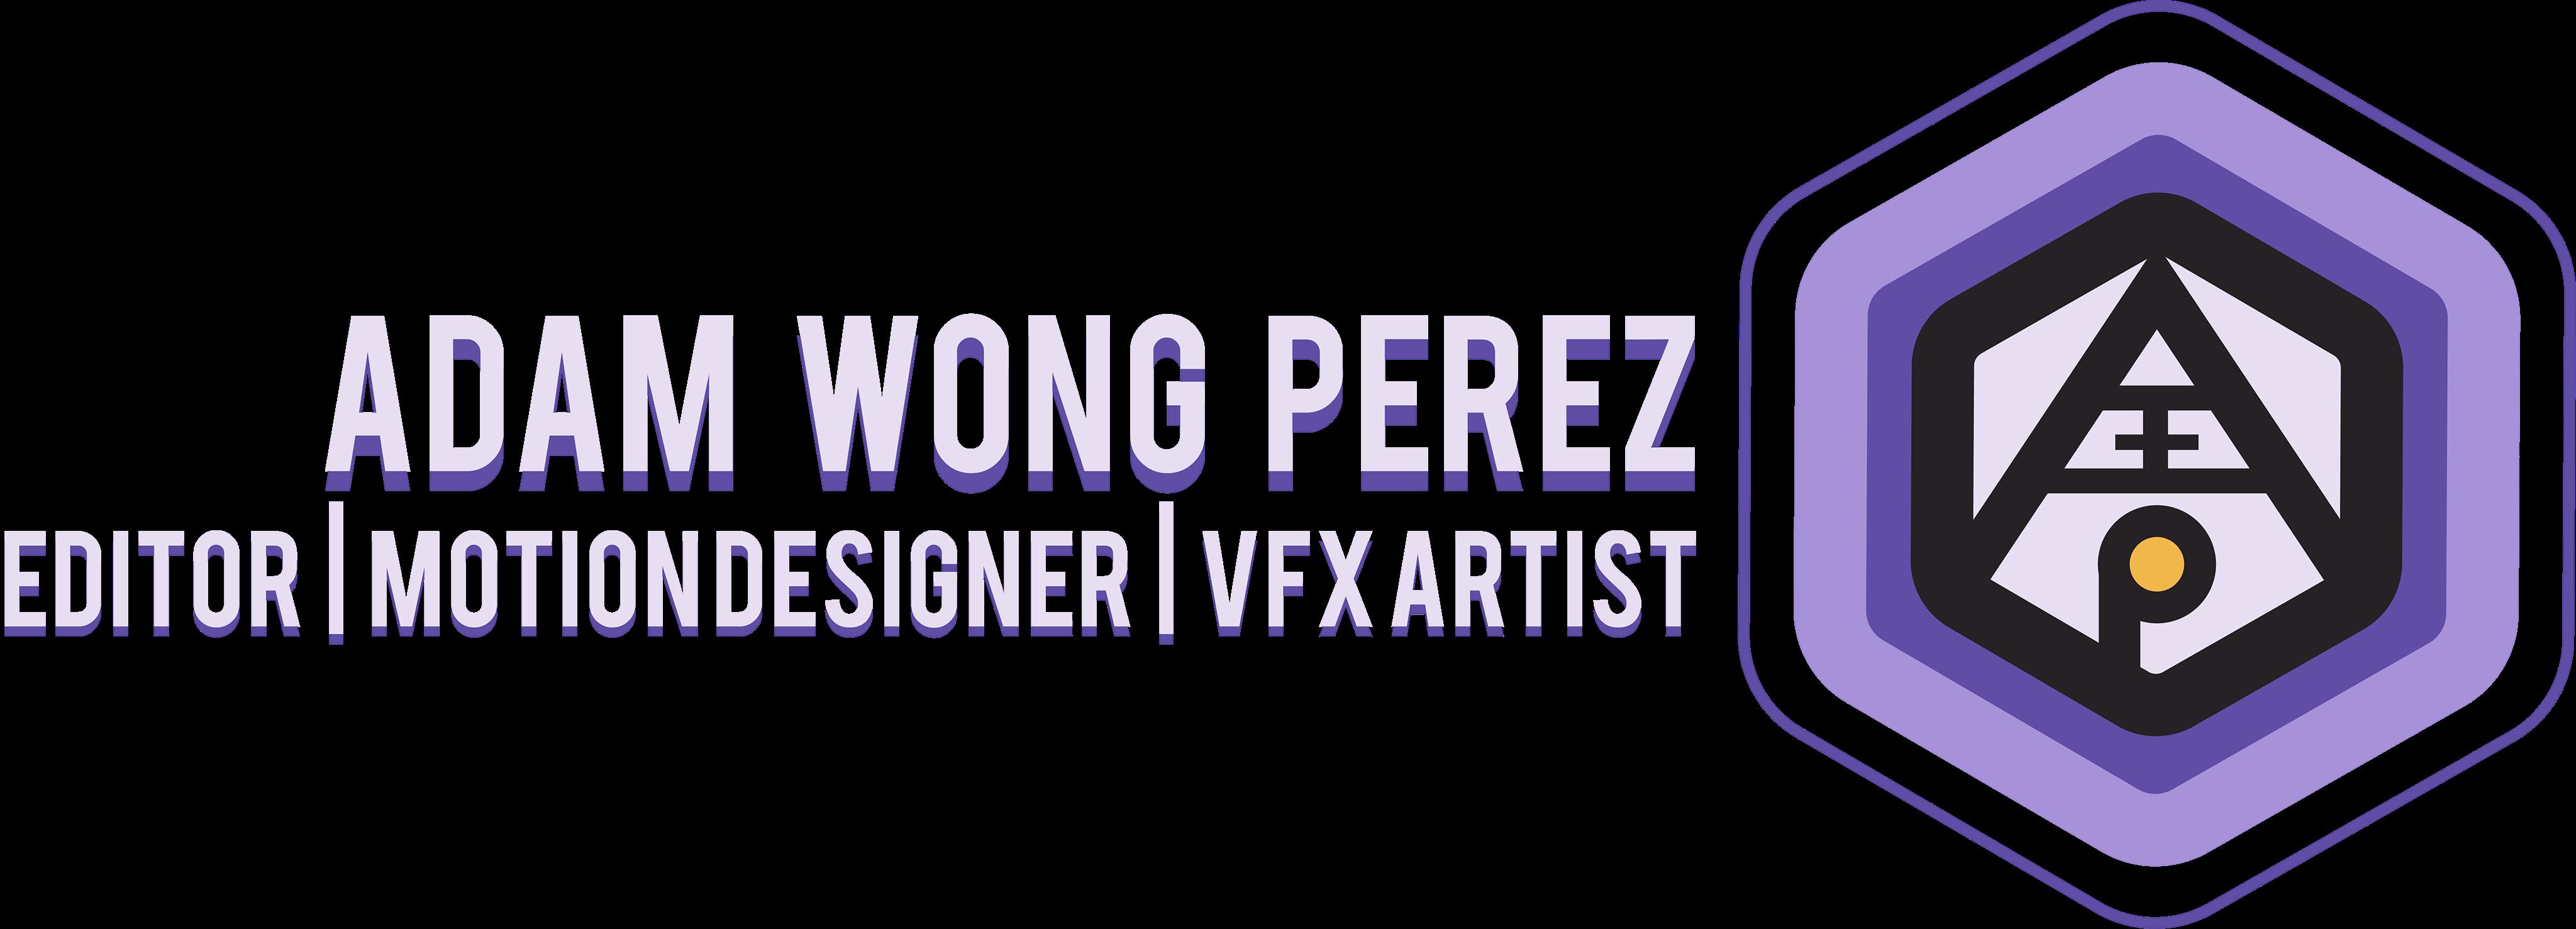 Adam Wong Perez